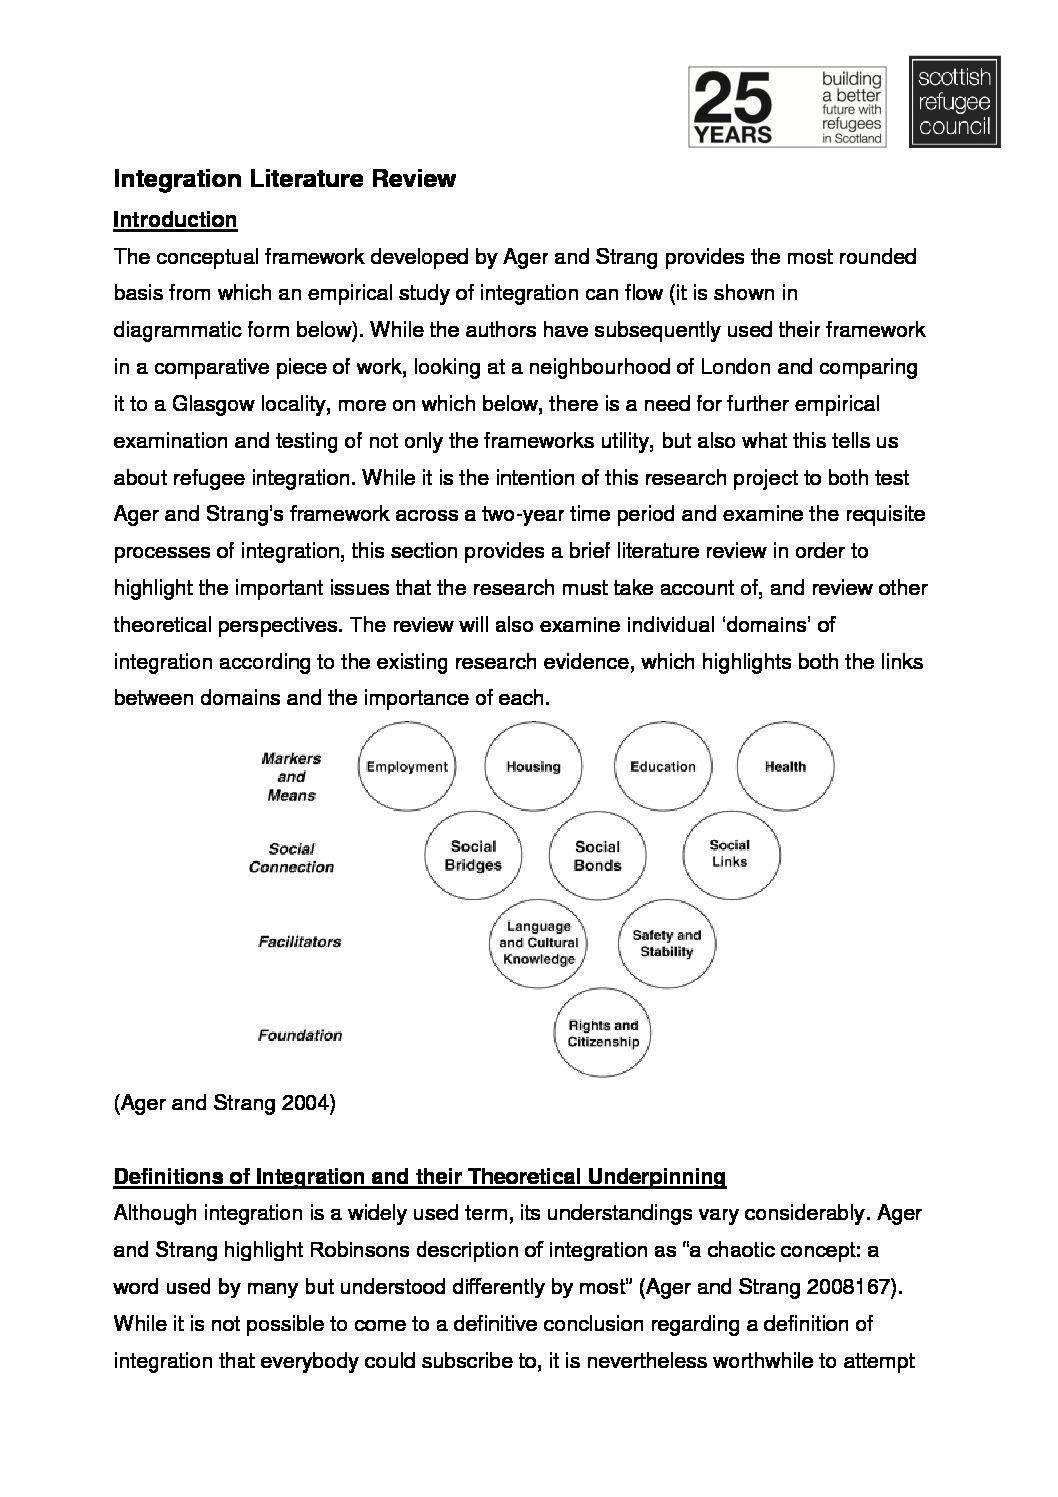 Integration-Literature-Review-Feb-2010-pdf